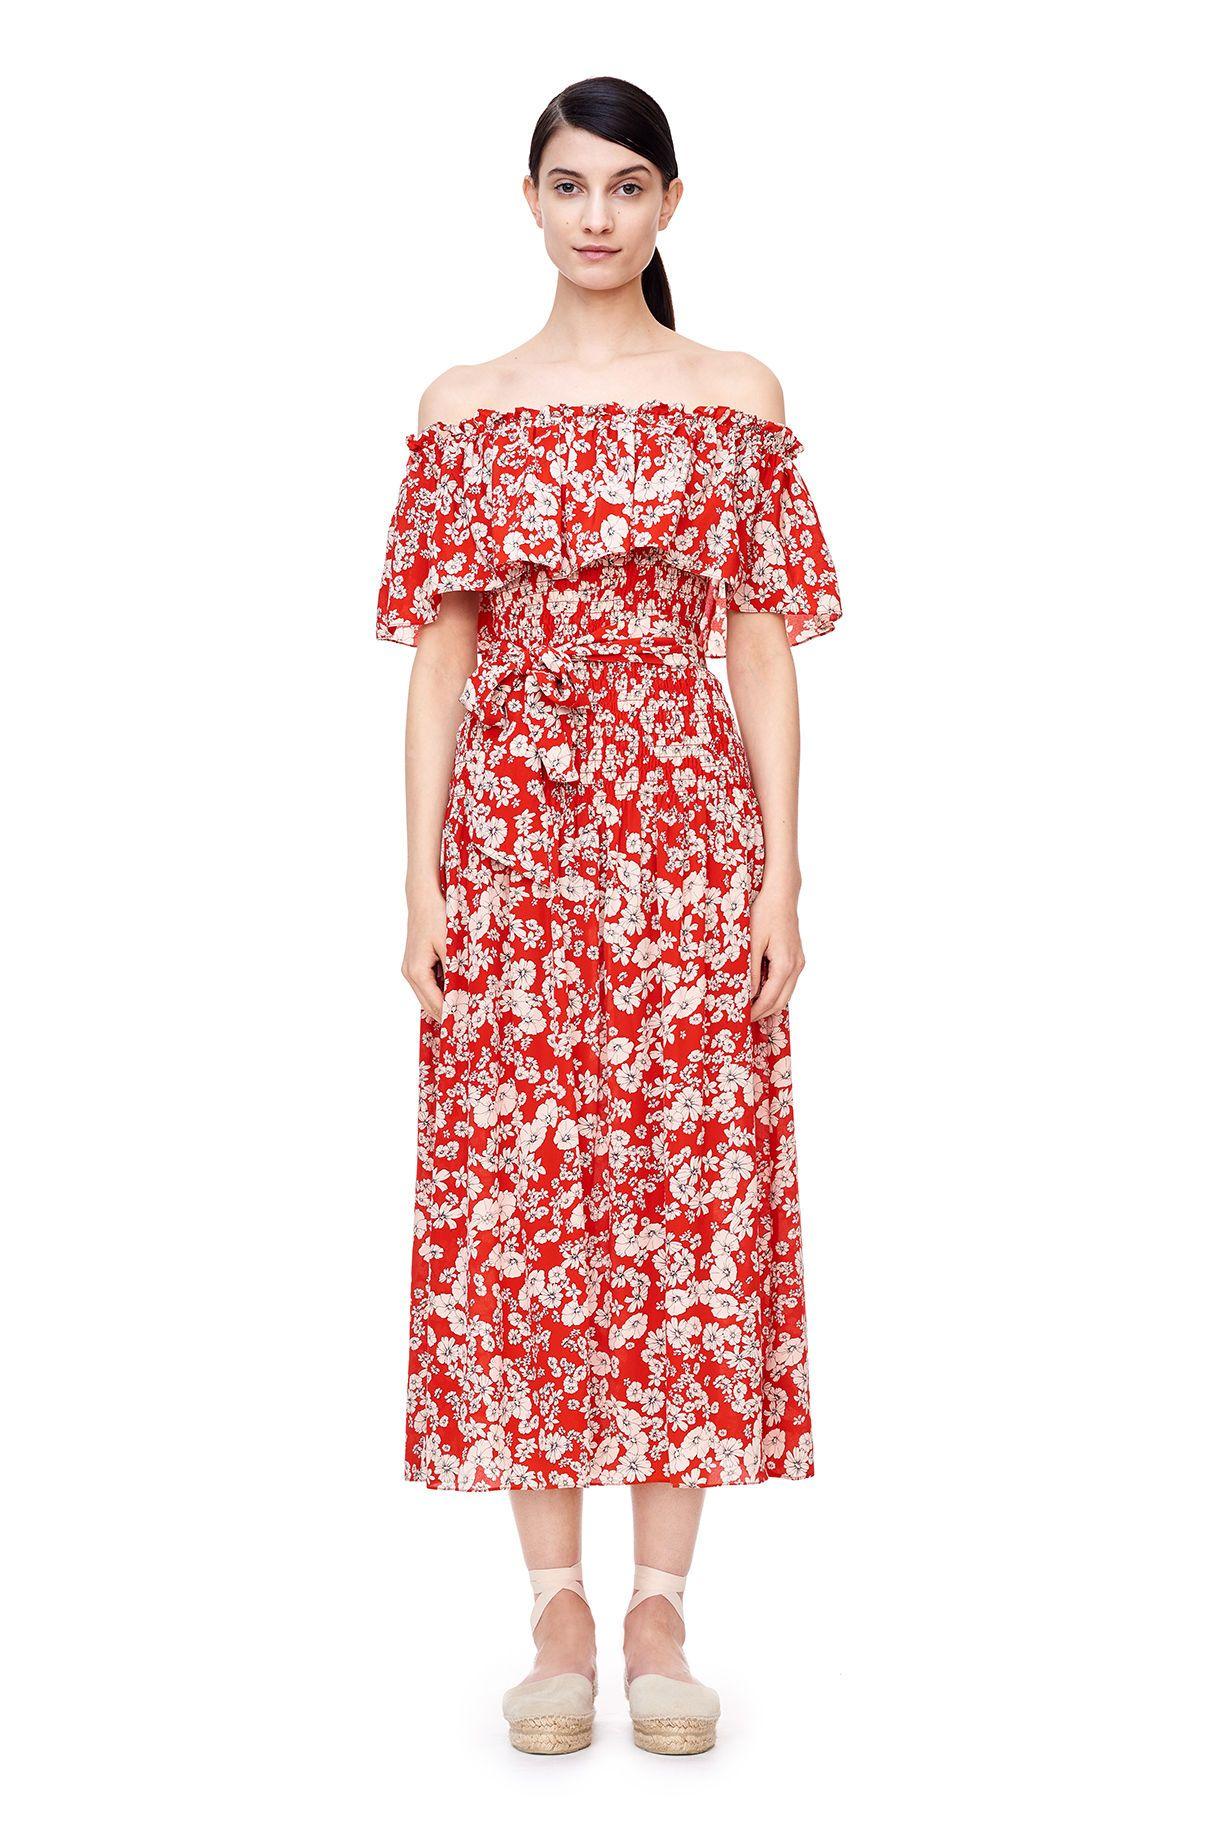 Off-The-Shoulder Cherry Blossom Dress   Cherry blossoms, Printed ...